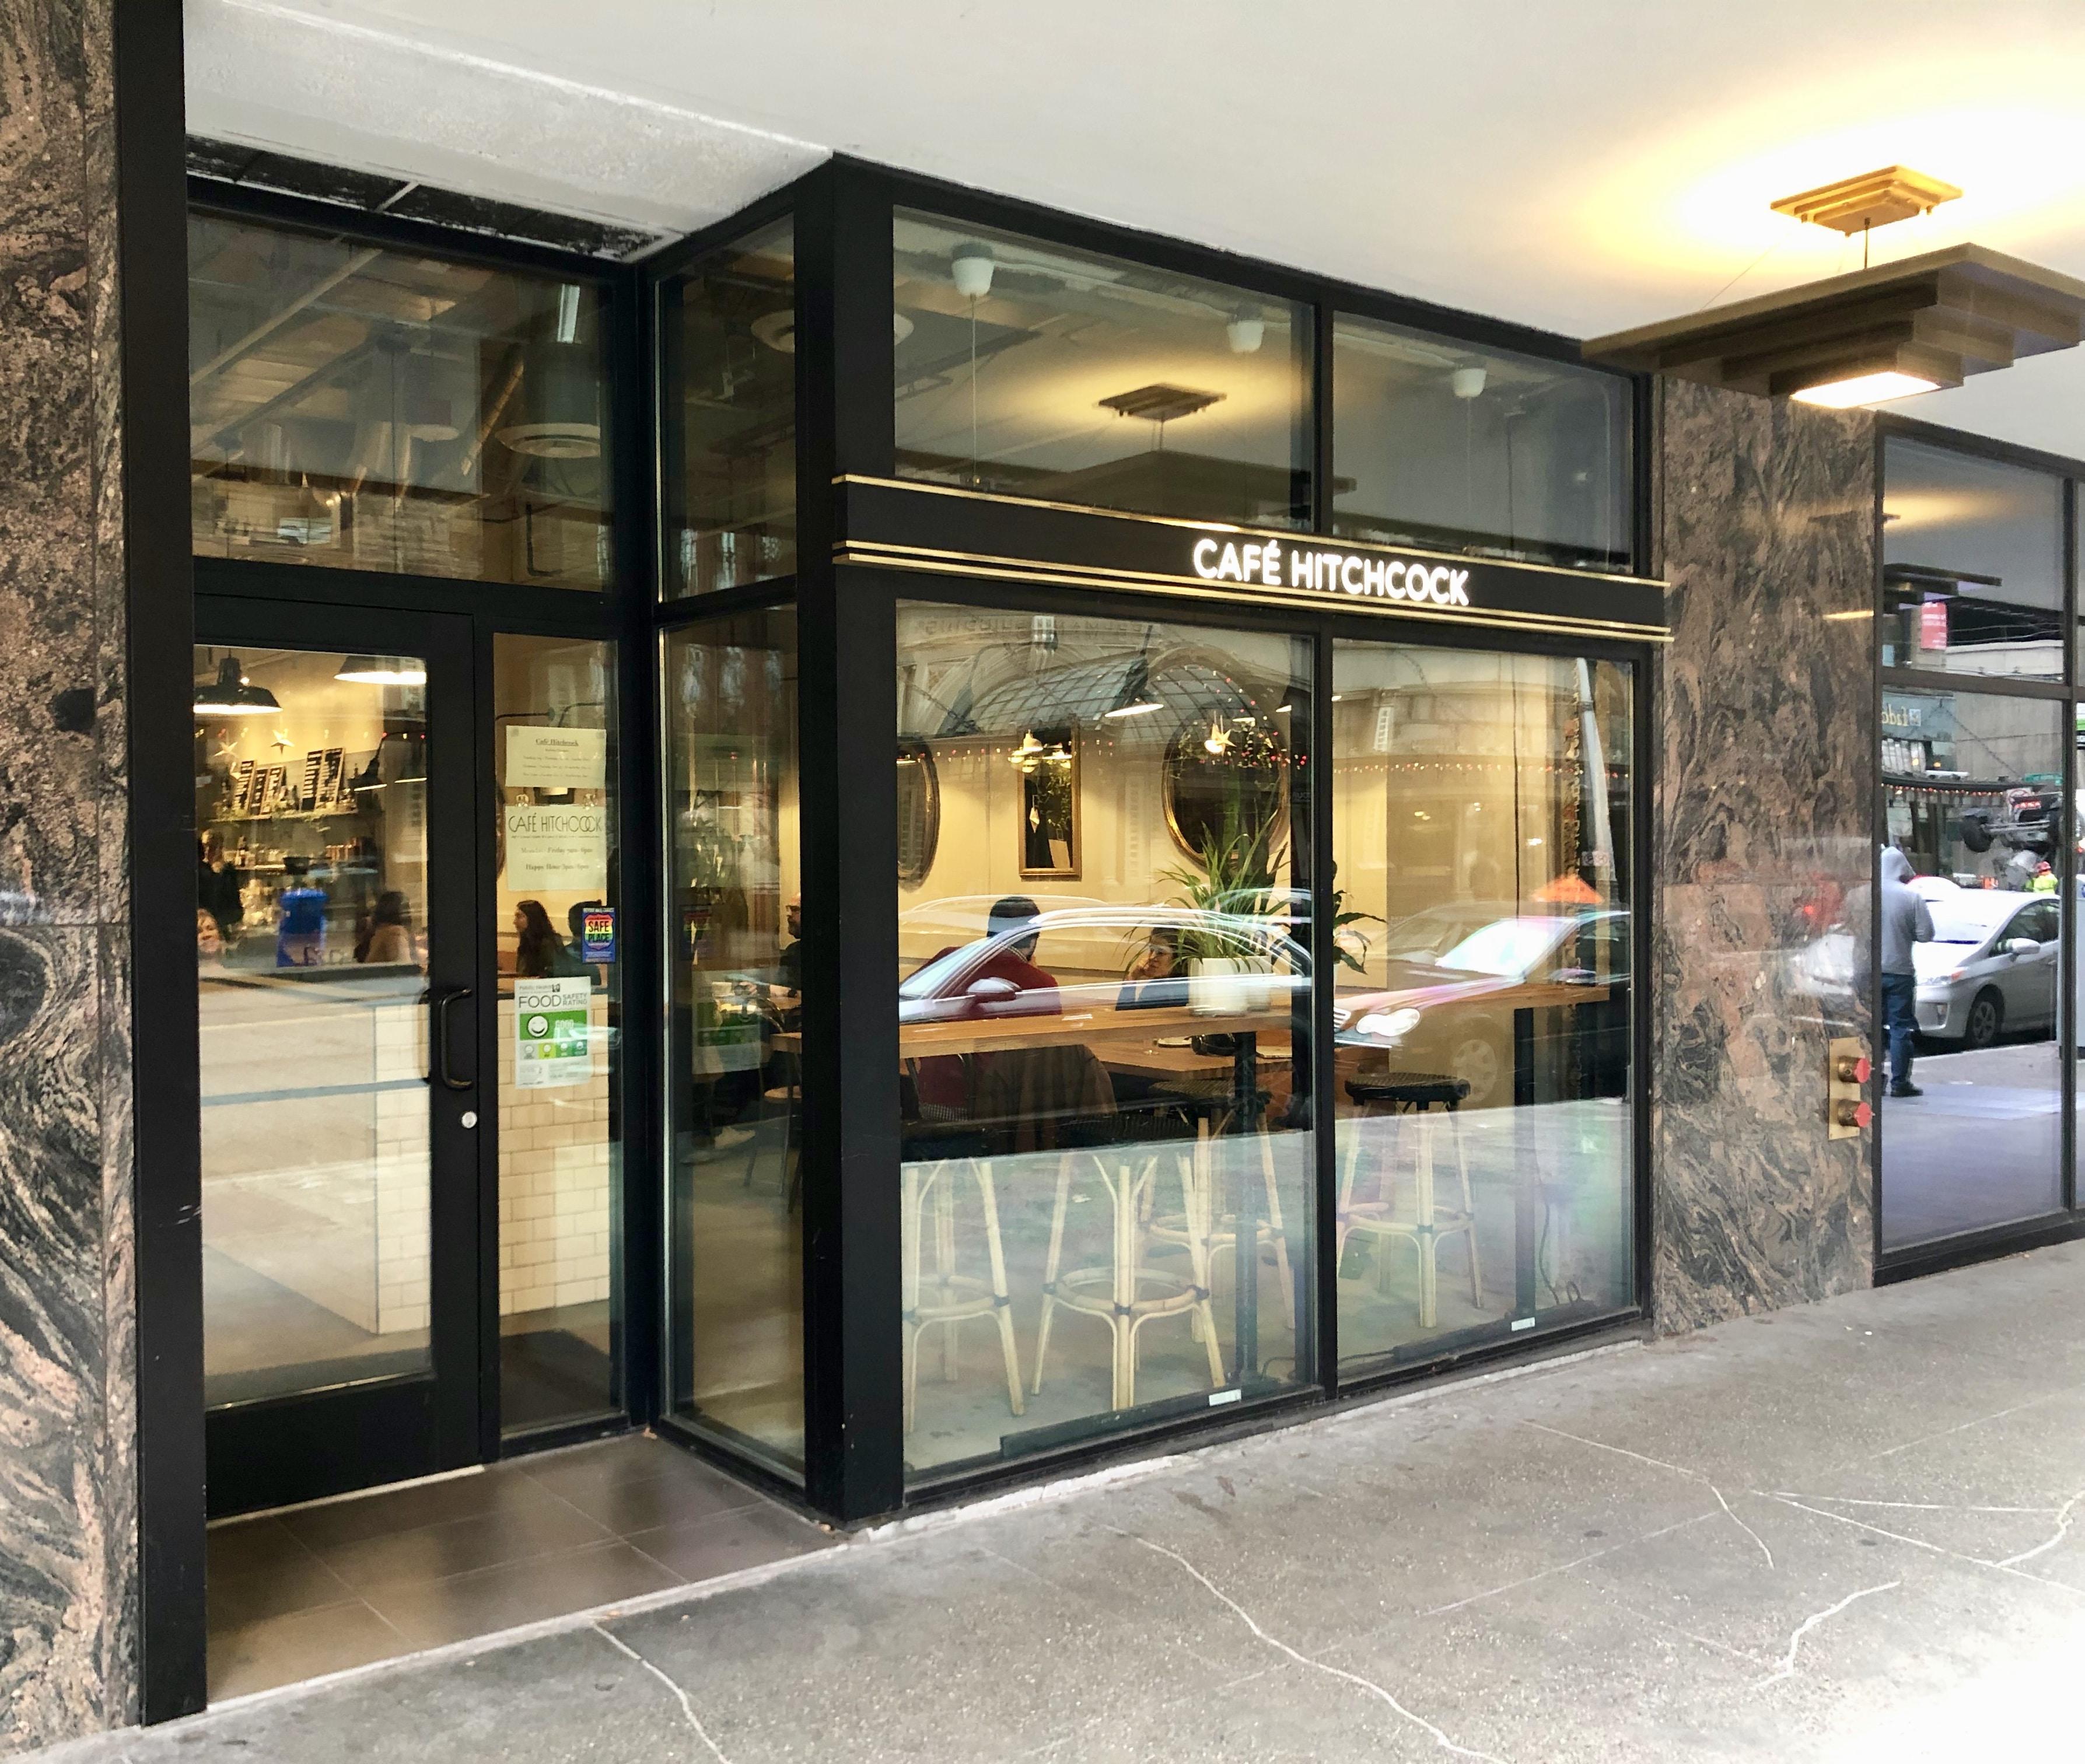 Café Hitchcock Entrance